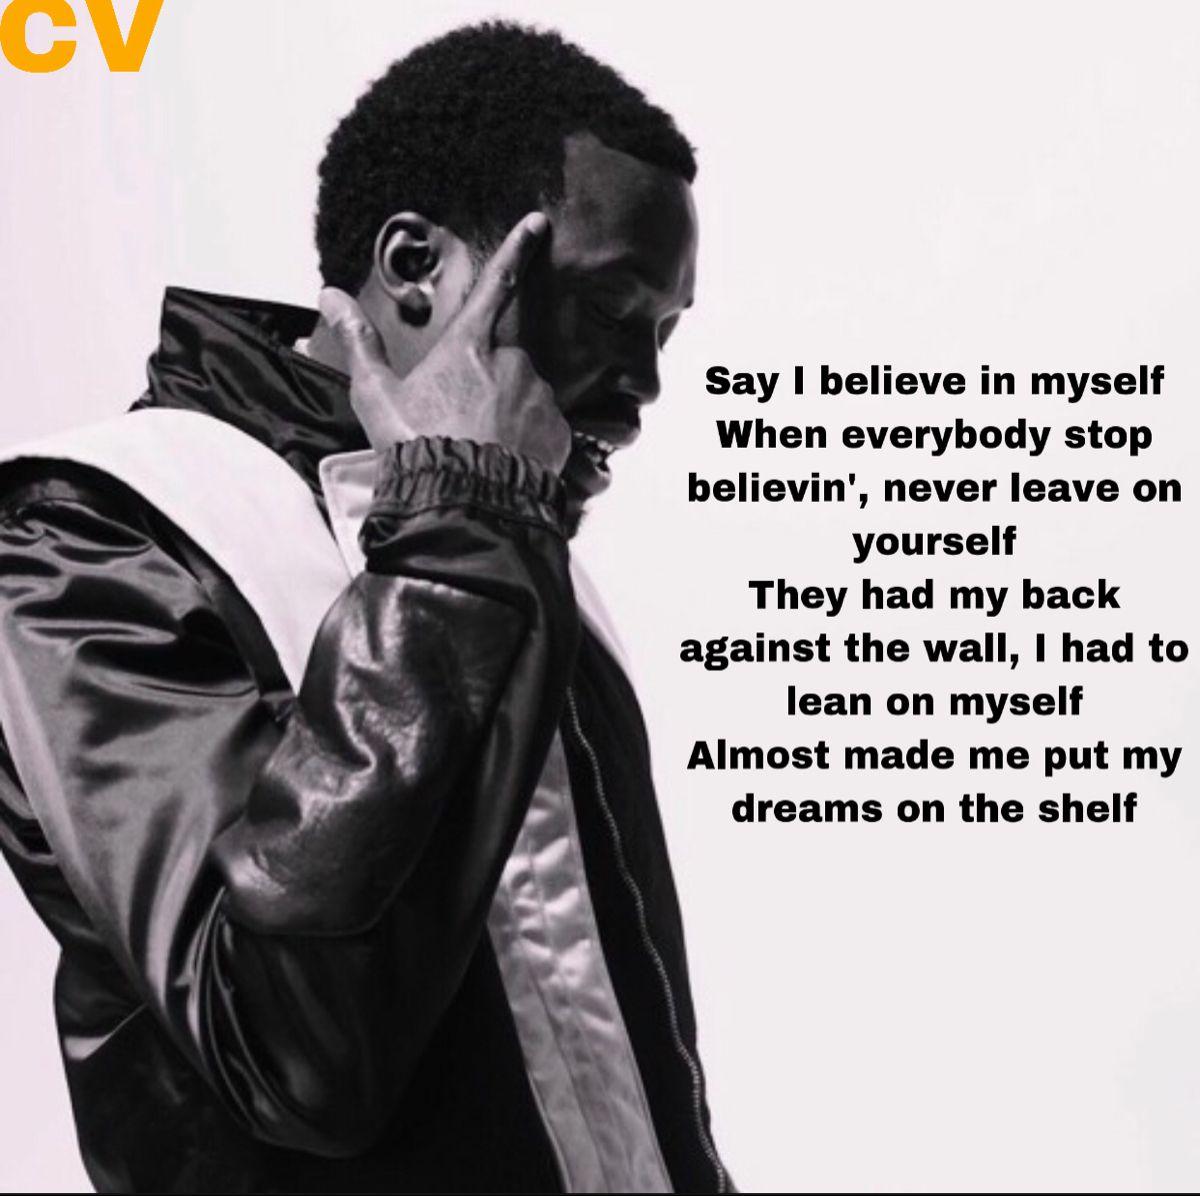 Meek Mill Lyrics Meek Mill Quotes Meek Mill Lyrics